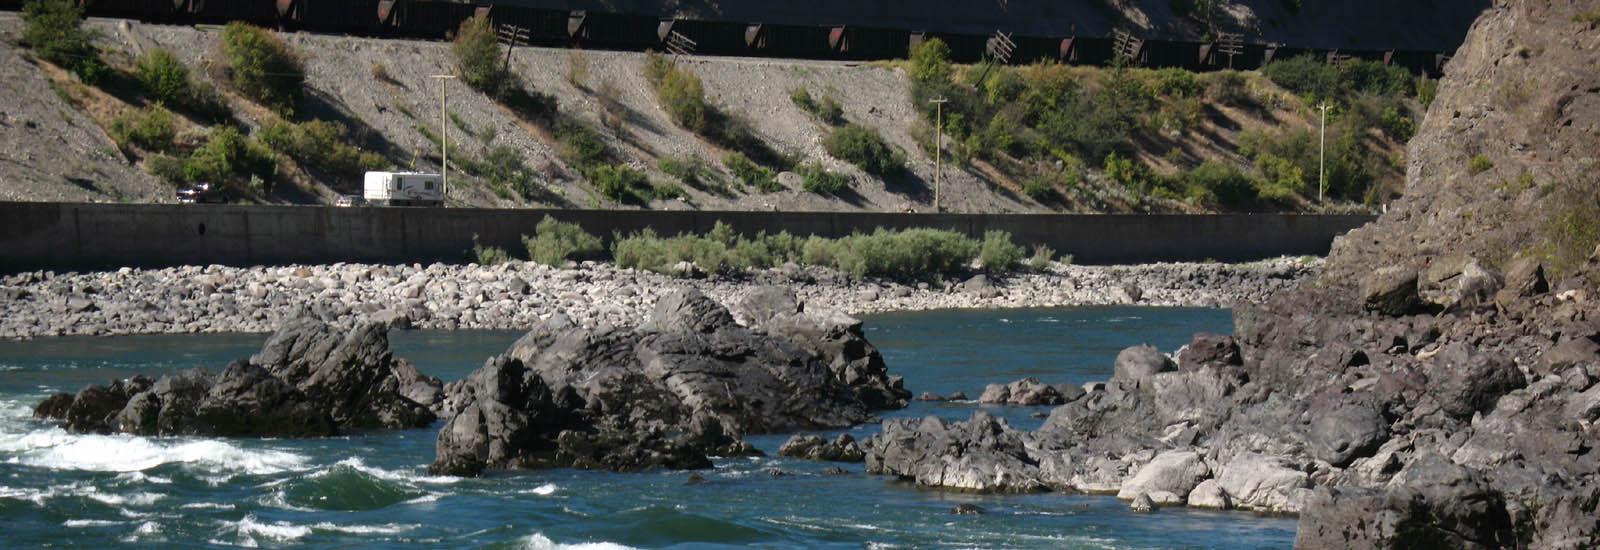 Thompson River near Spences Bridge -sliver